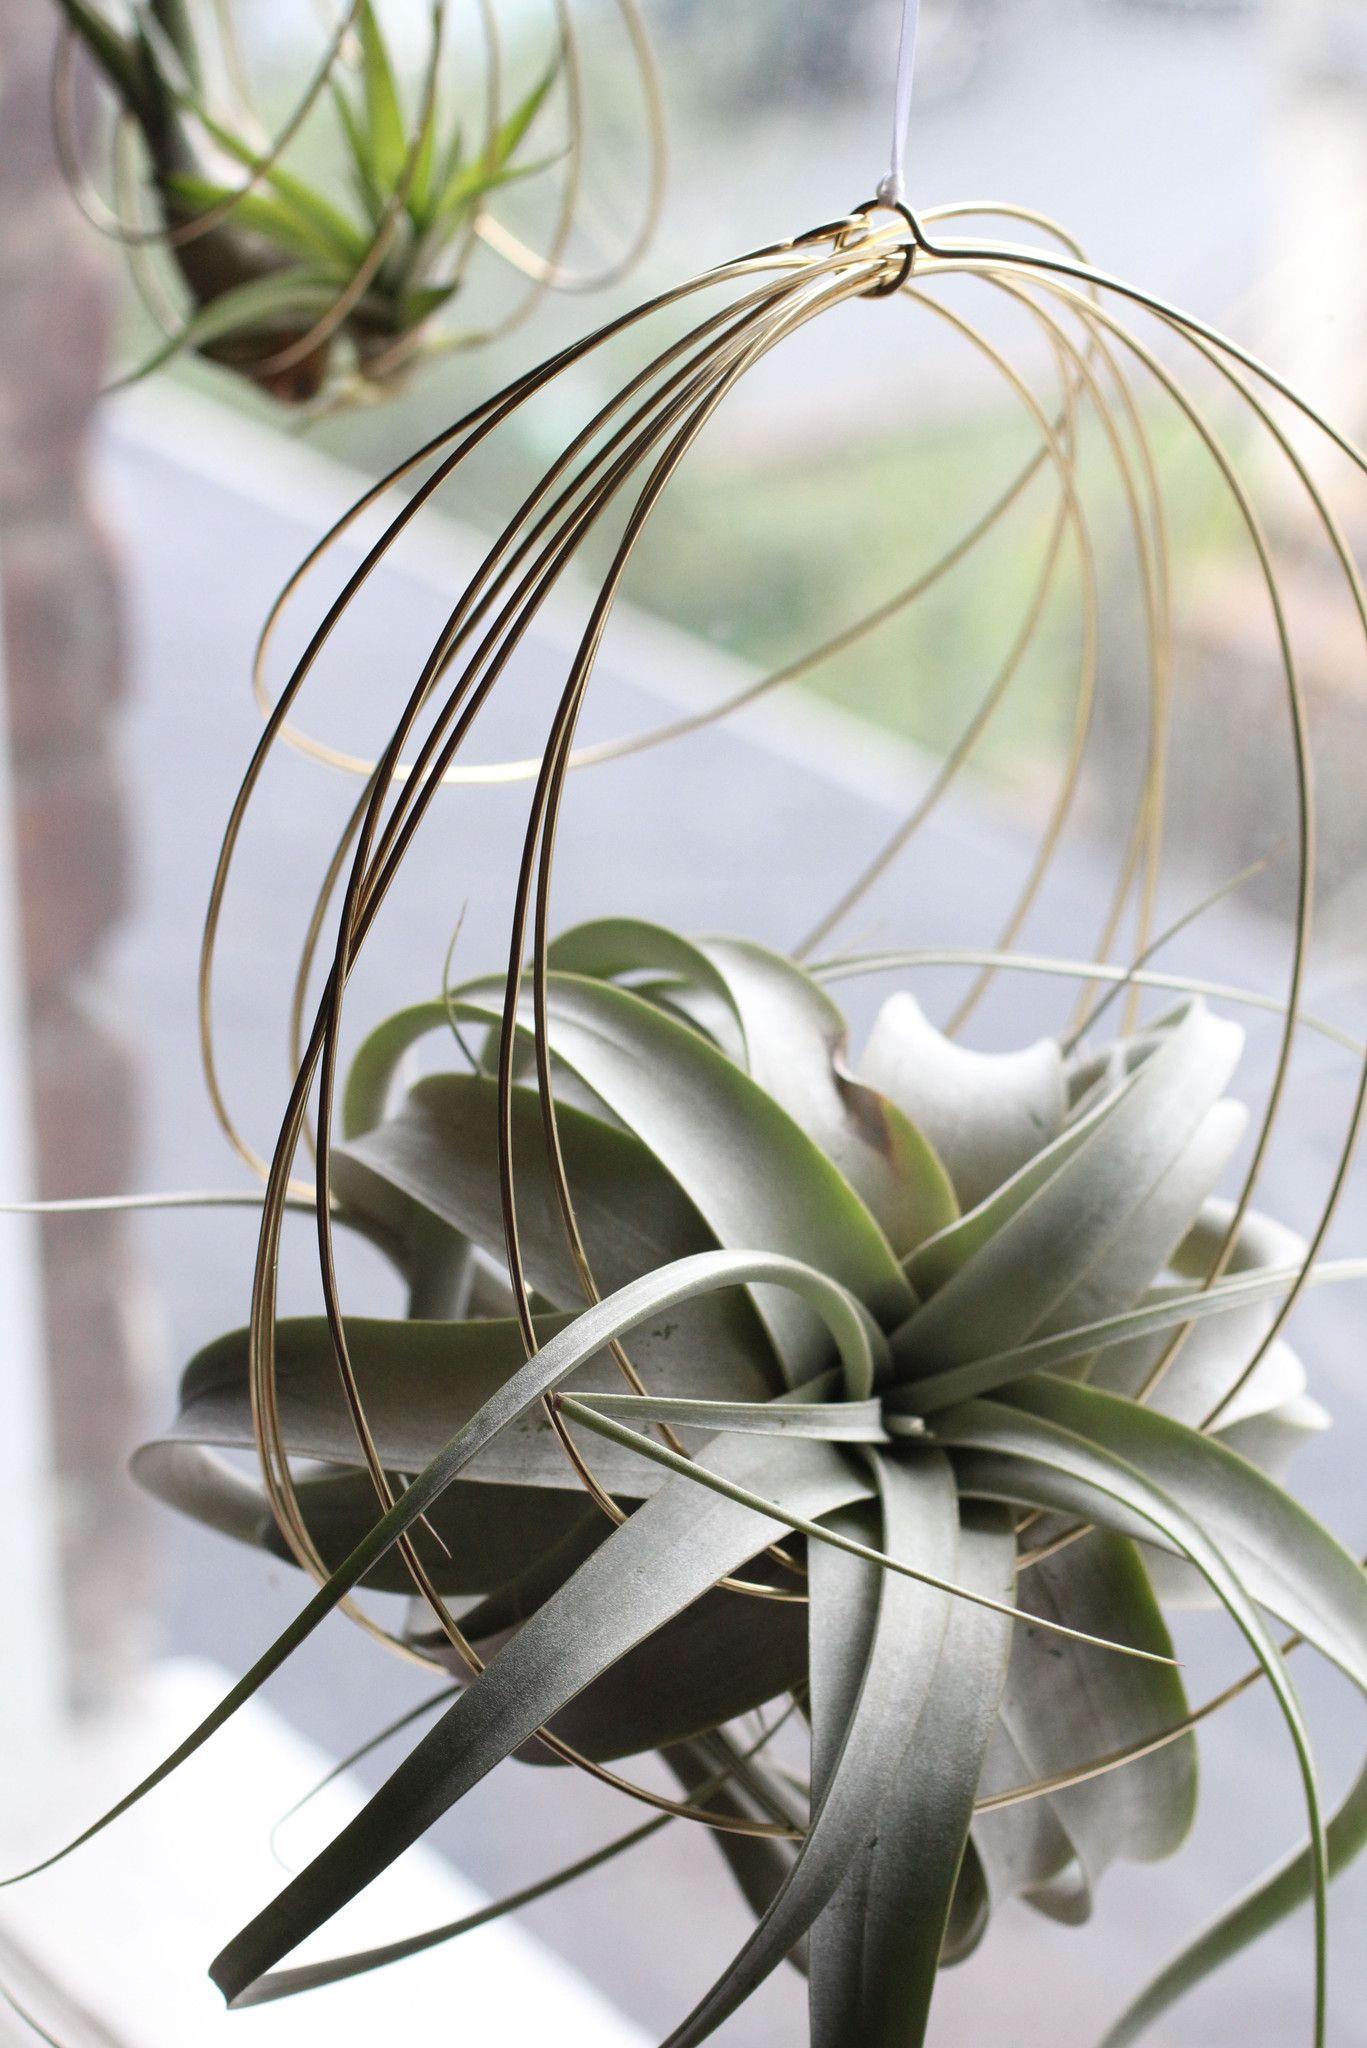 Large Tillandsia Ornament Hanging Air Plants Air Plants Decor Air Plant Ornament